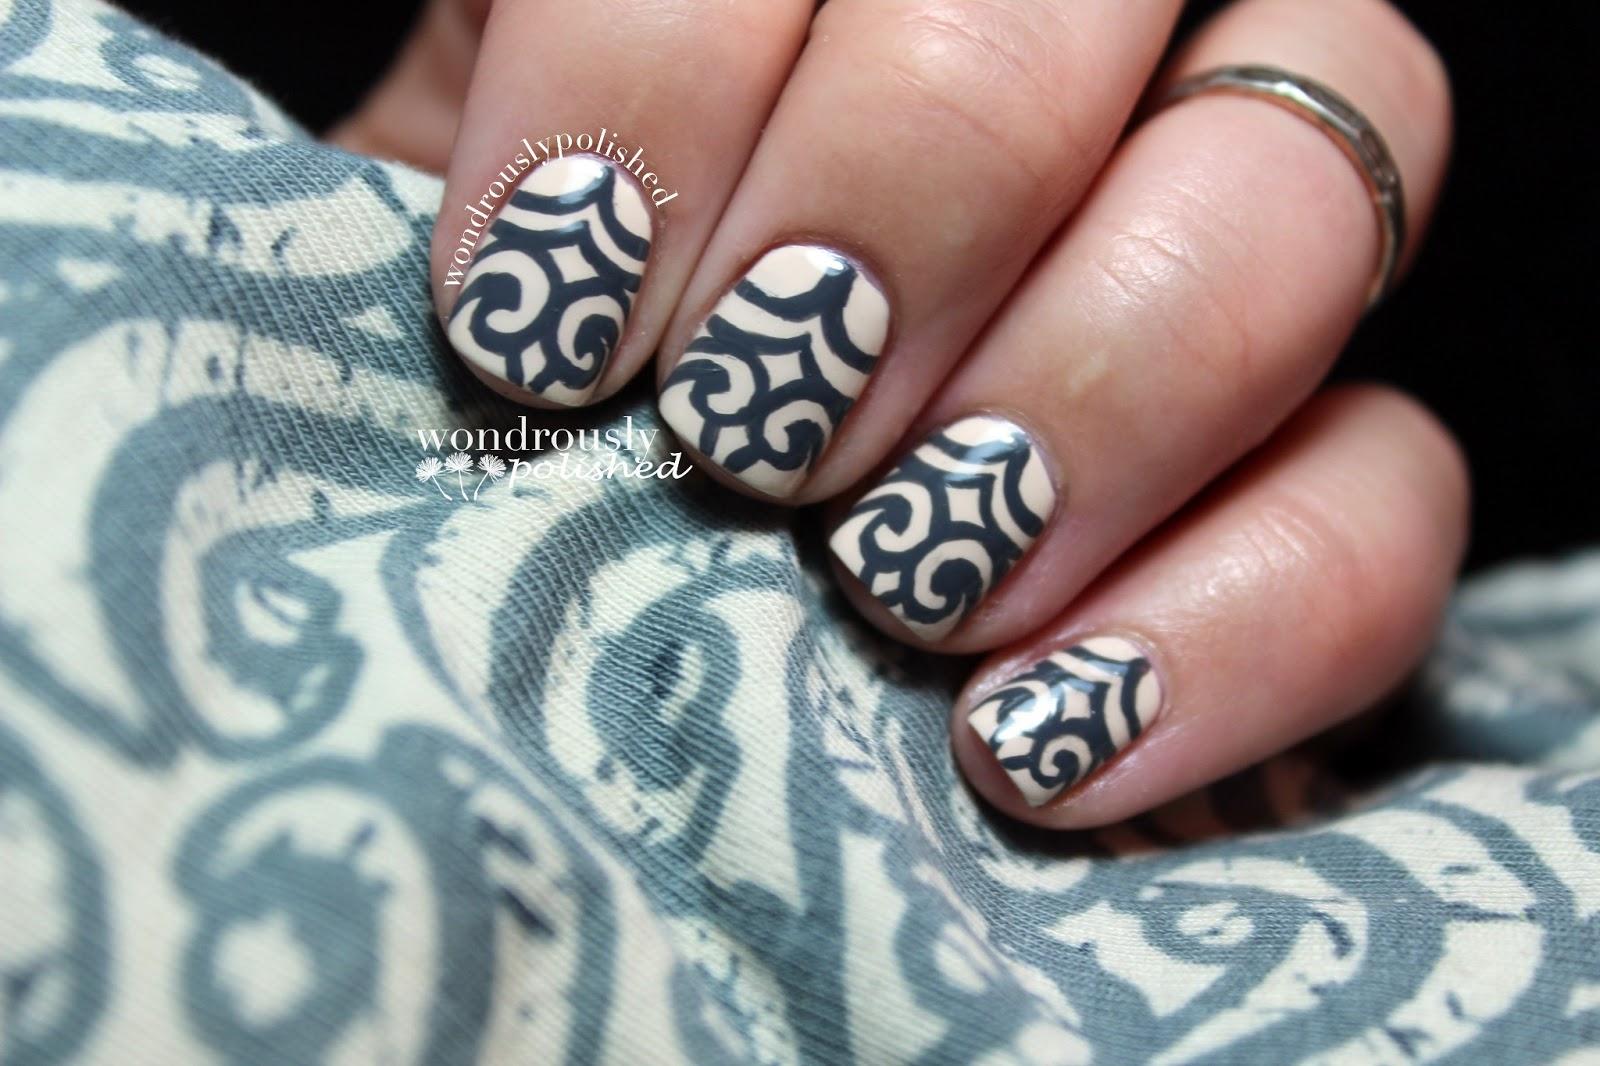 Wondrously Polished April Nail Art Challenge Ootd